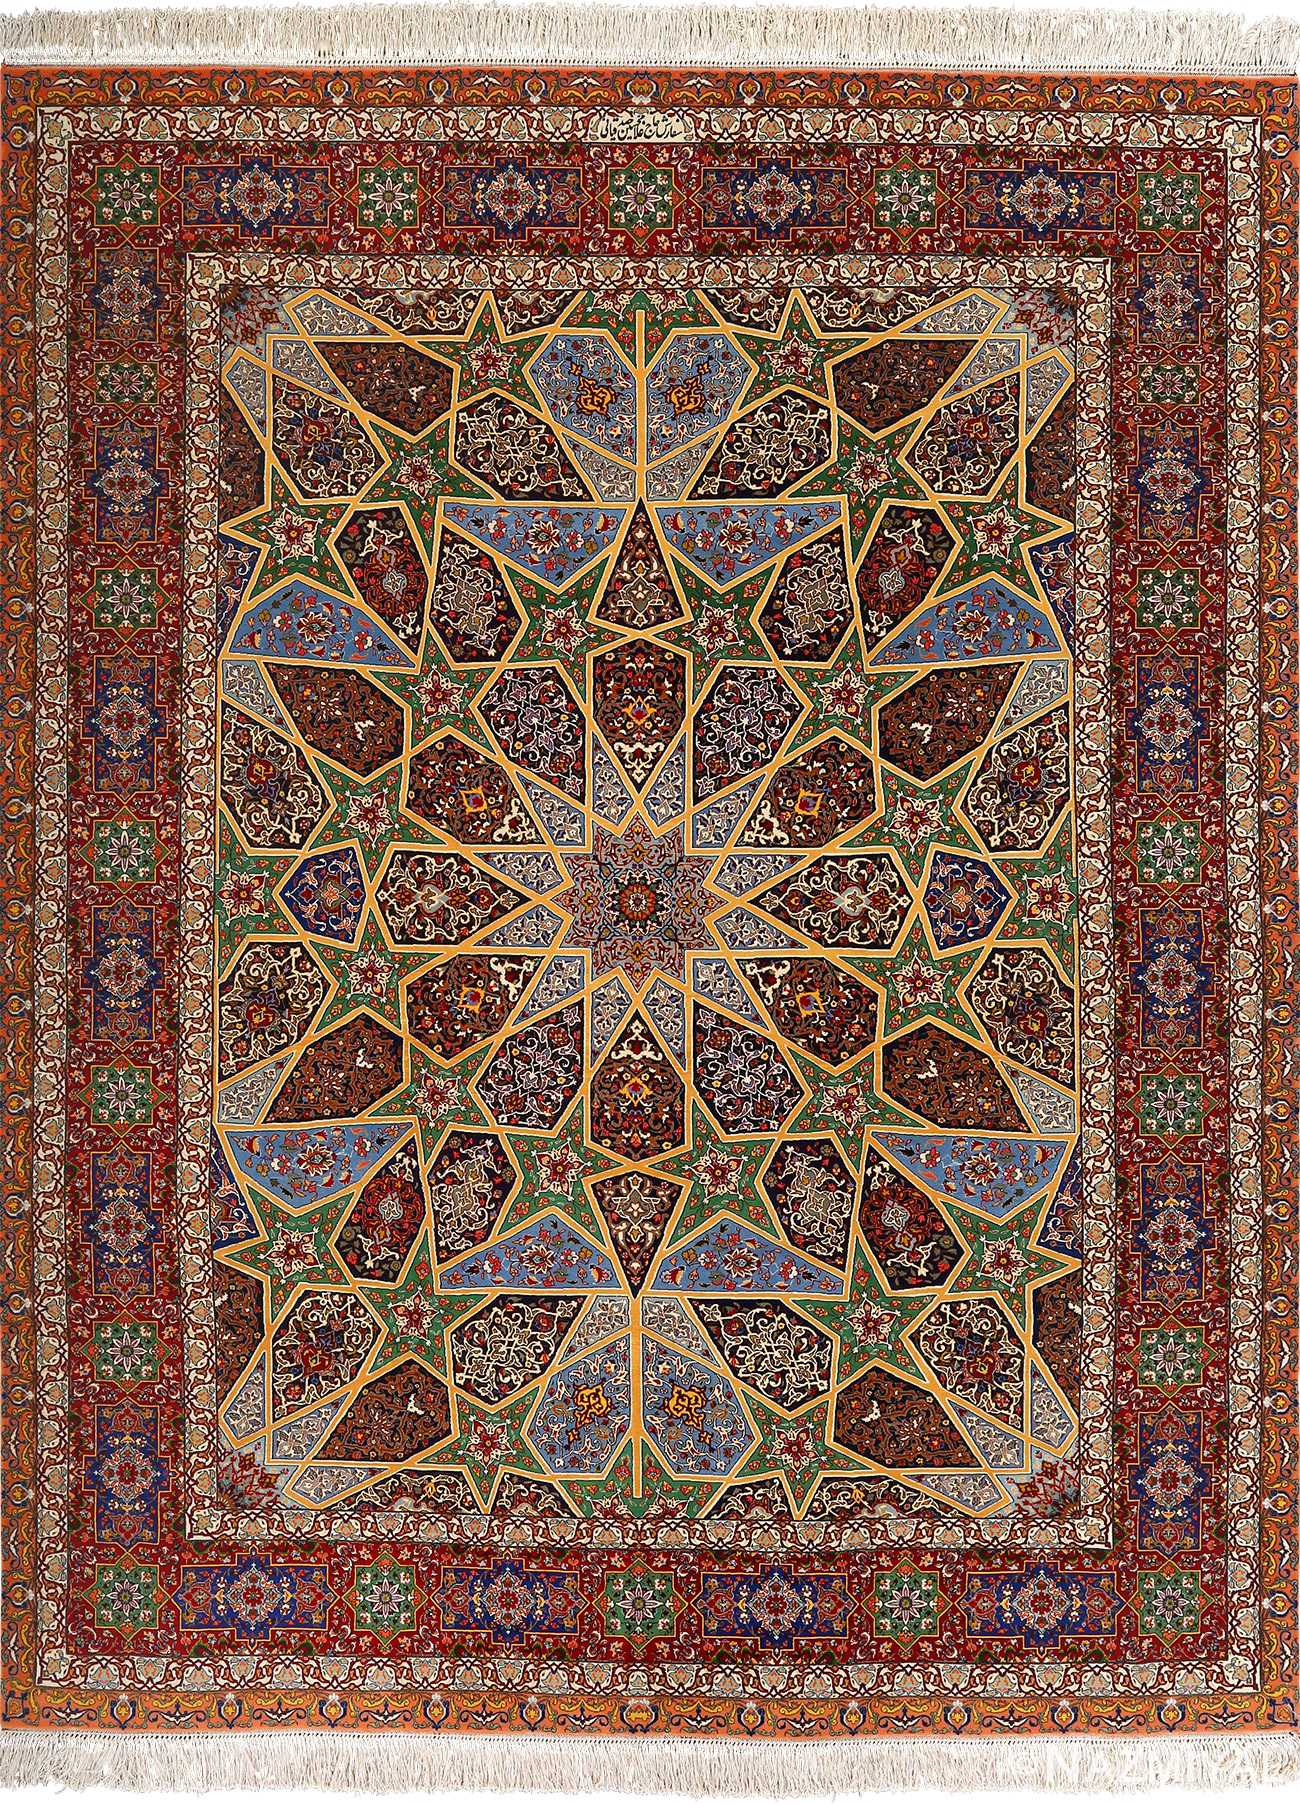 fine seyrafian vintage ghonbad silk foundation tabriz persian rug 51002 by Nazmiyal